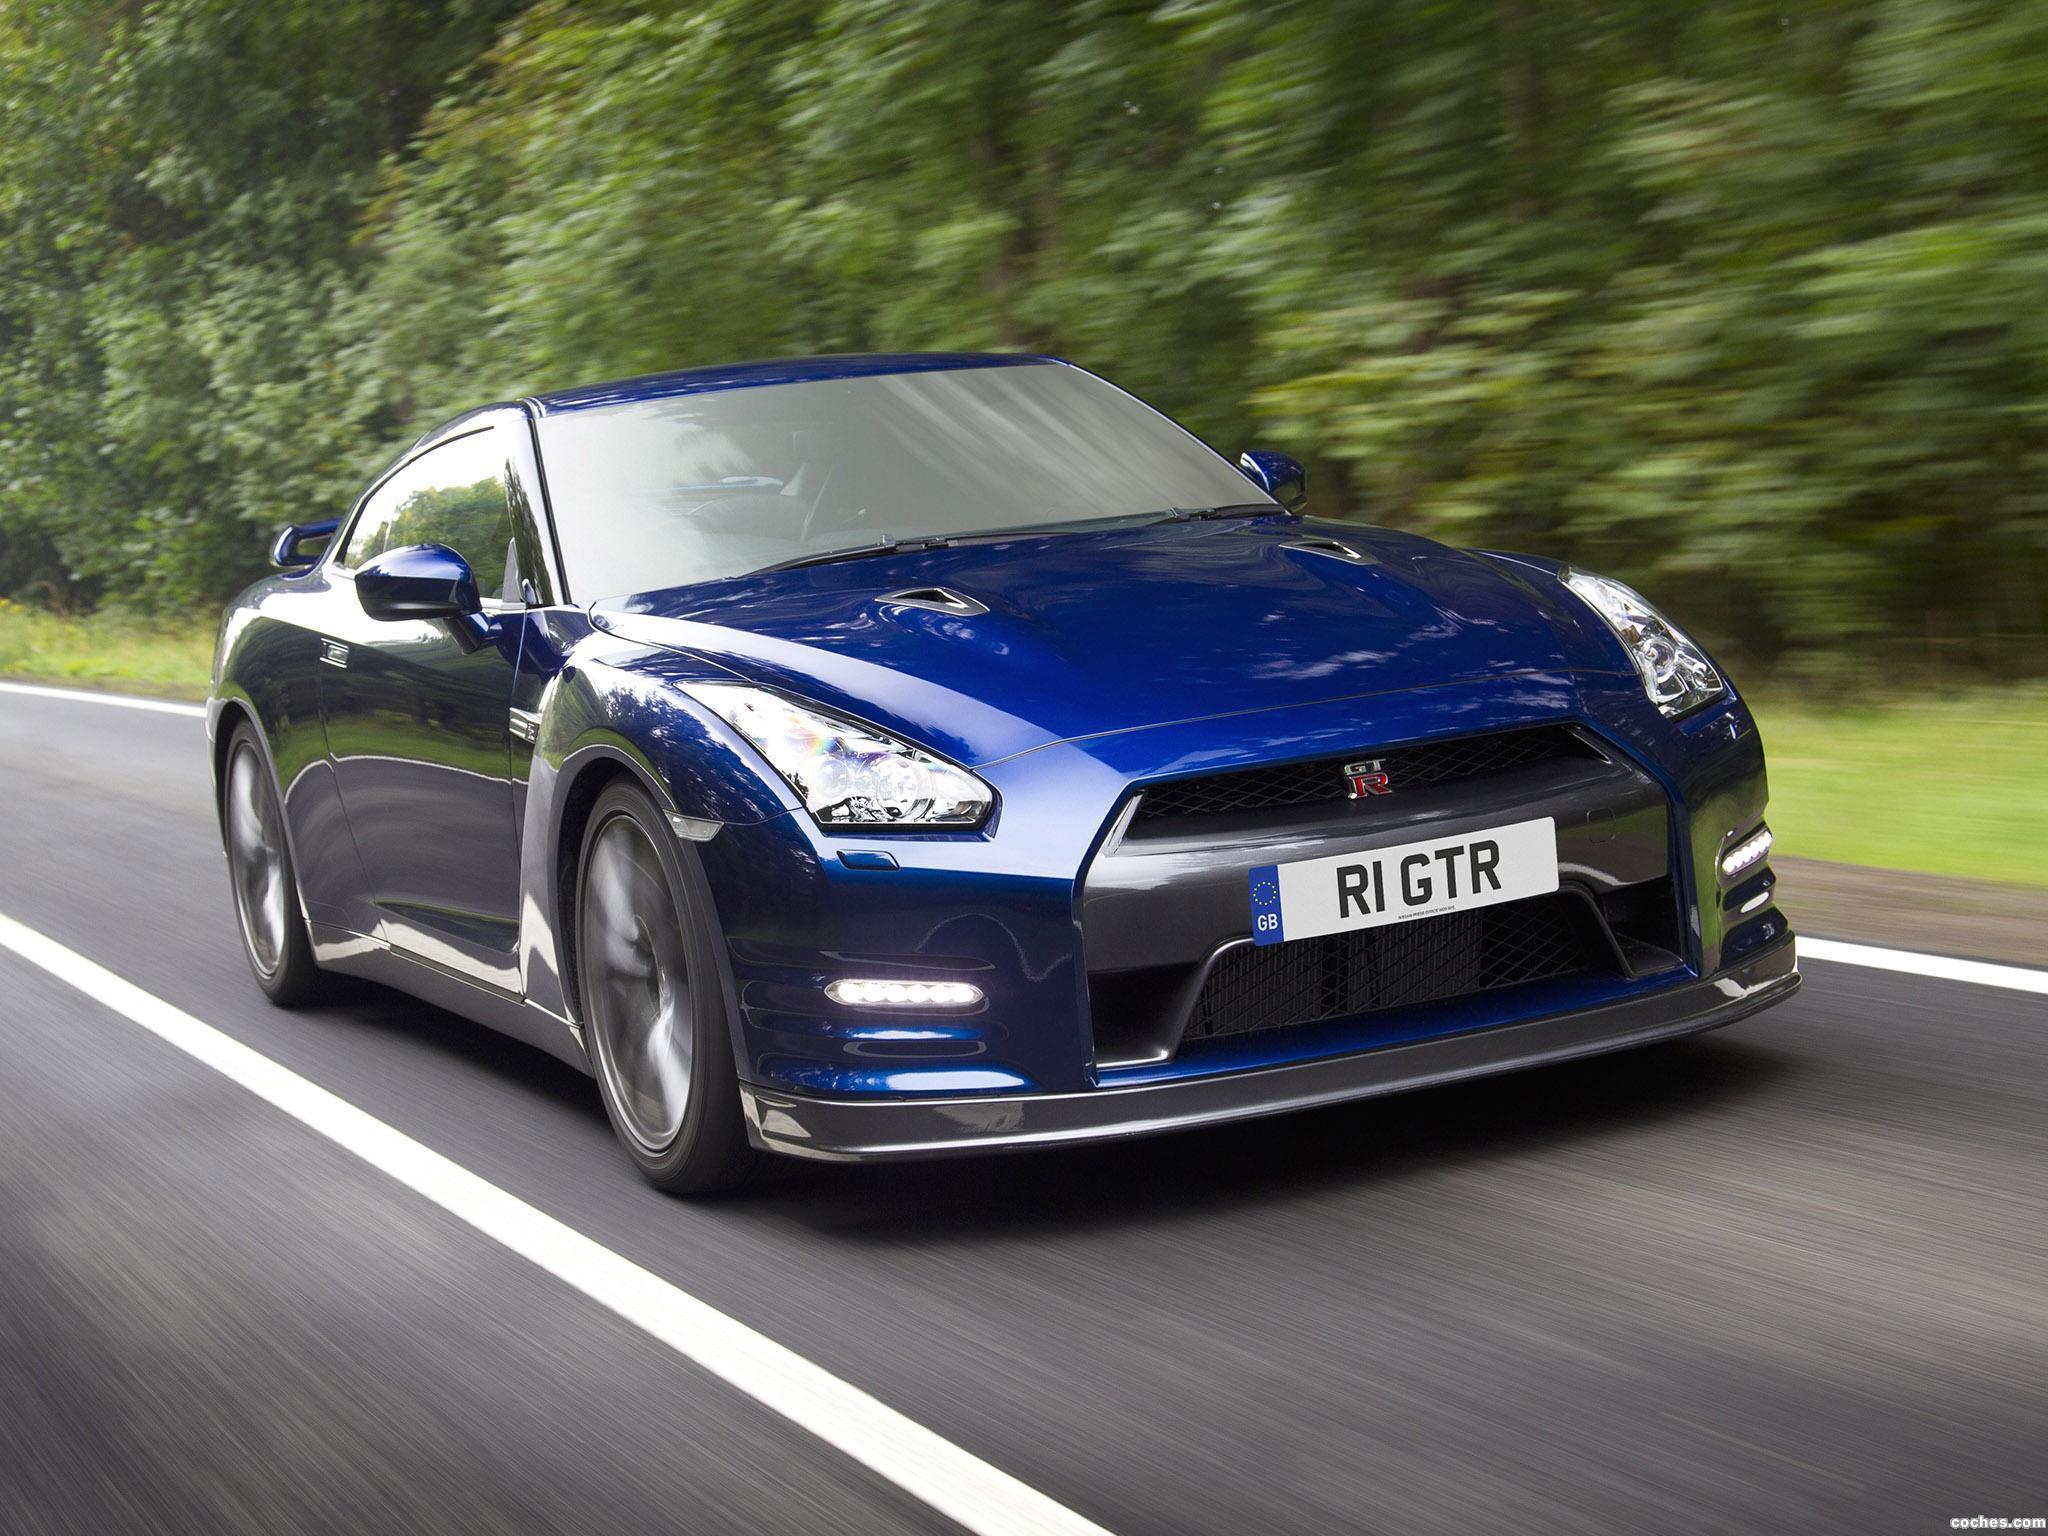 Foto 0 de Nissan GT-R UK 2010